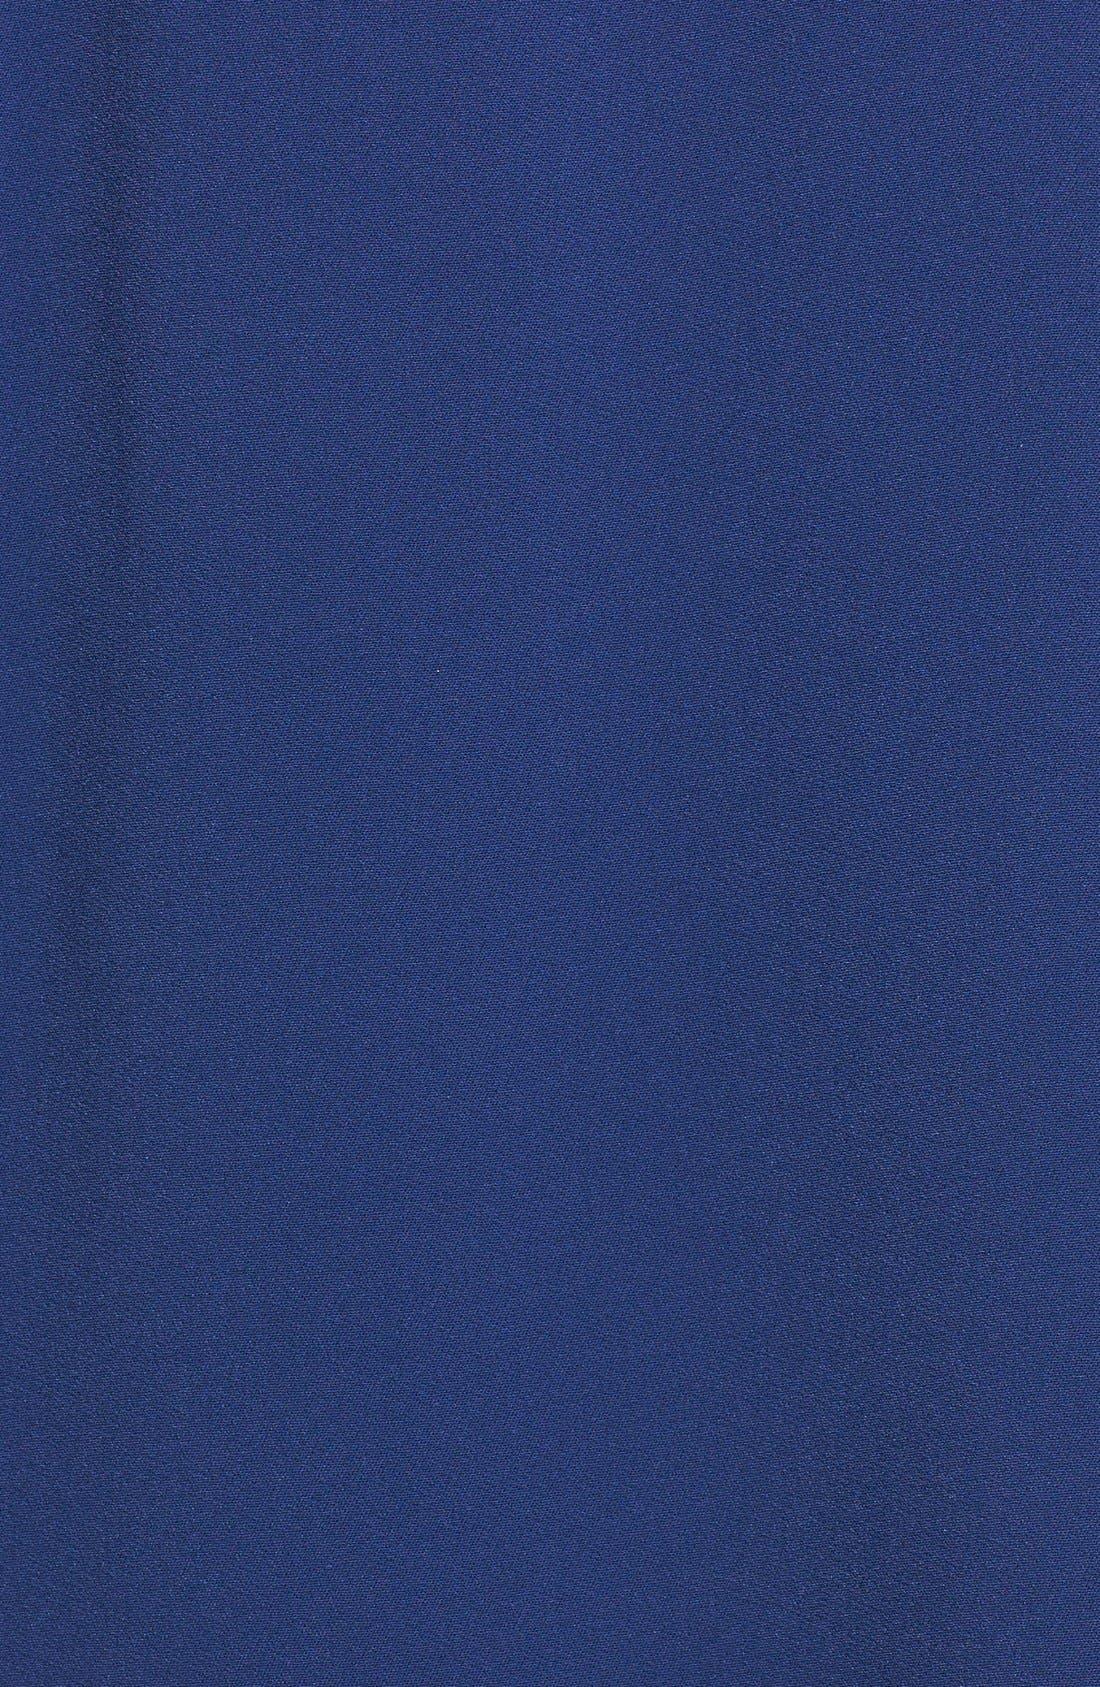 Alternate Image 3  - Theory 'Ballia' Stretch Sheath Dress